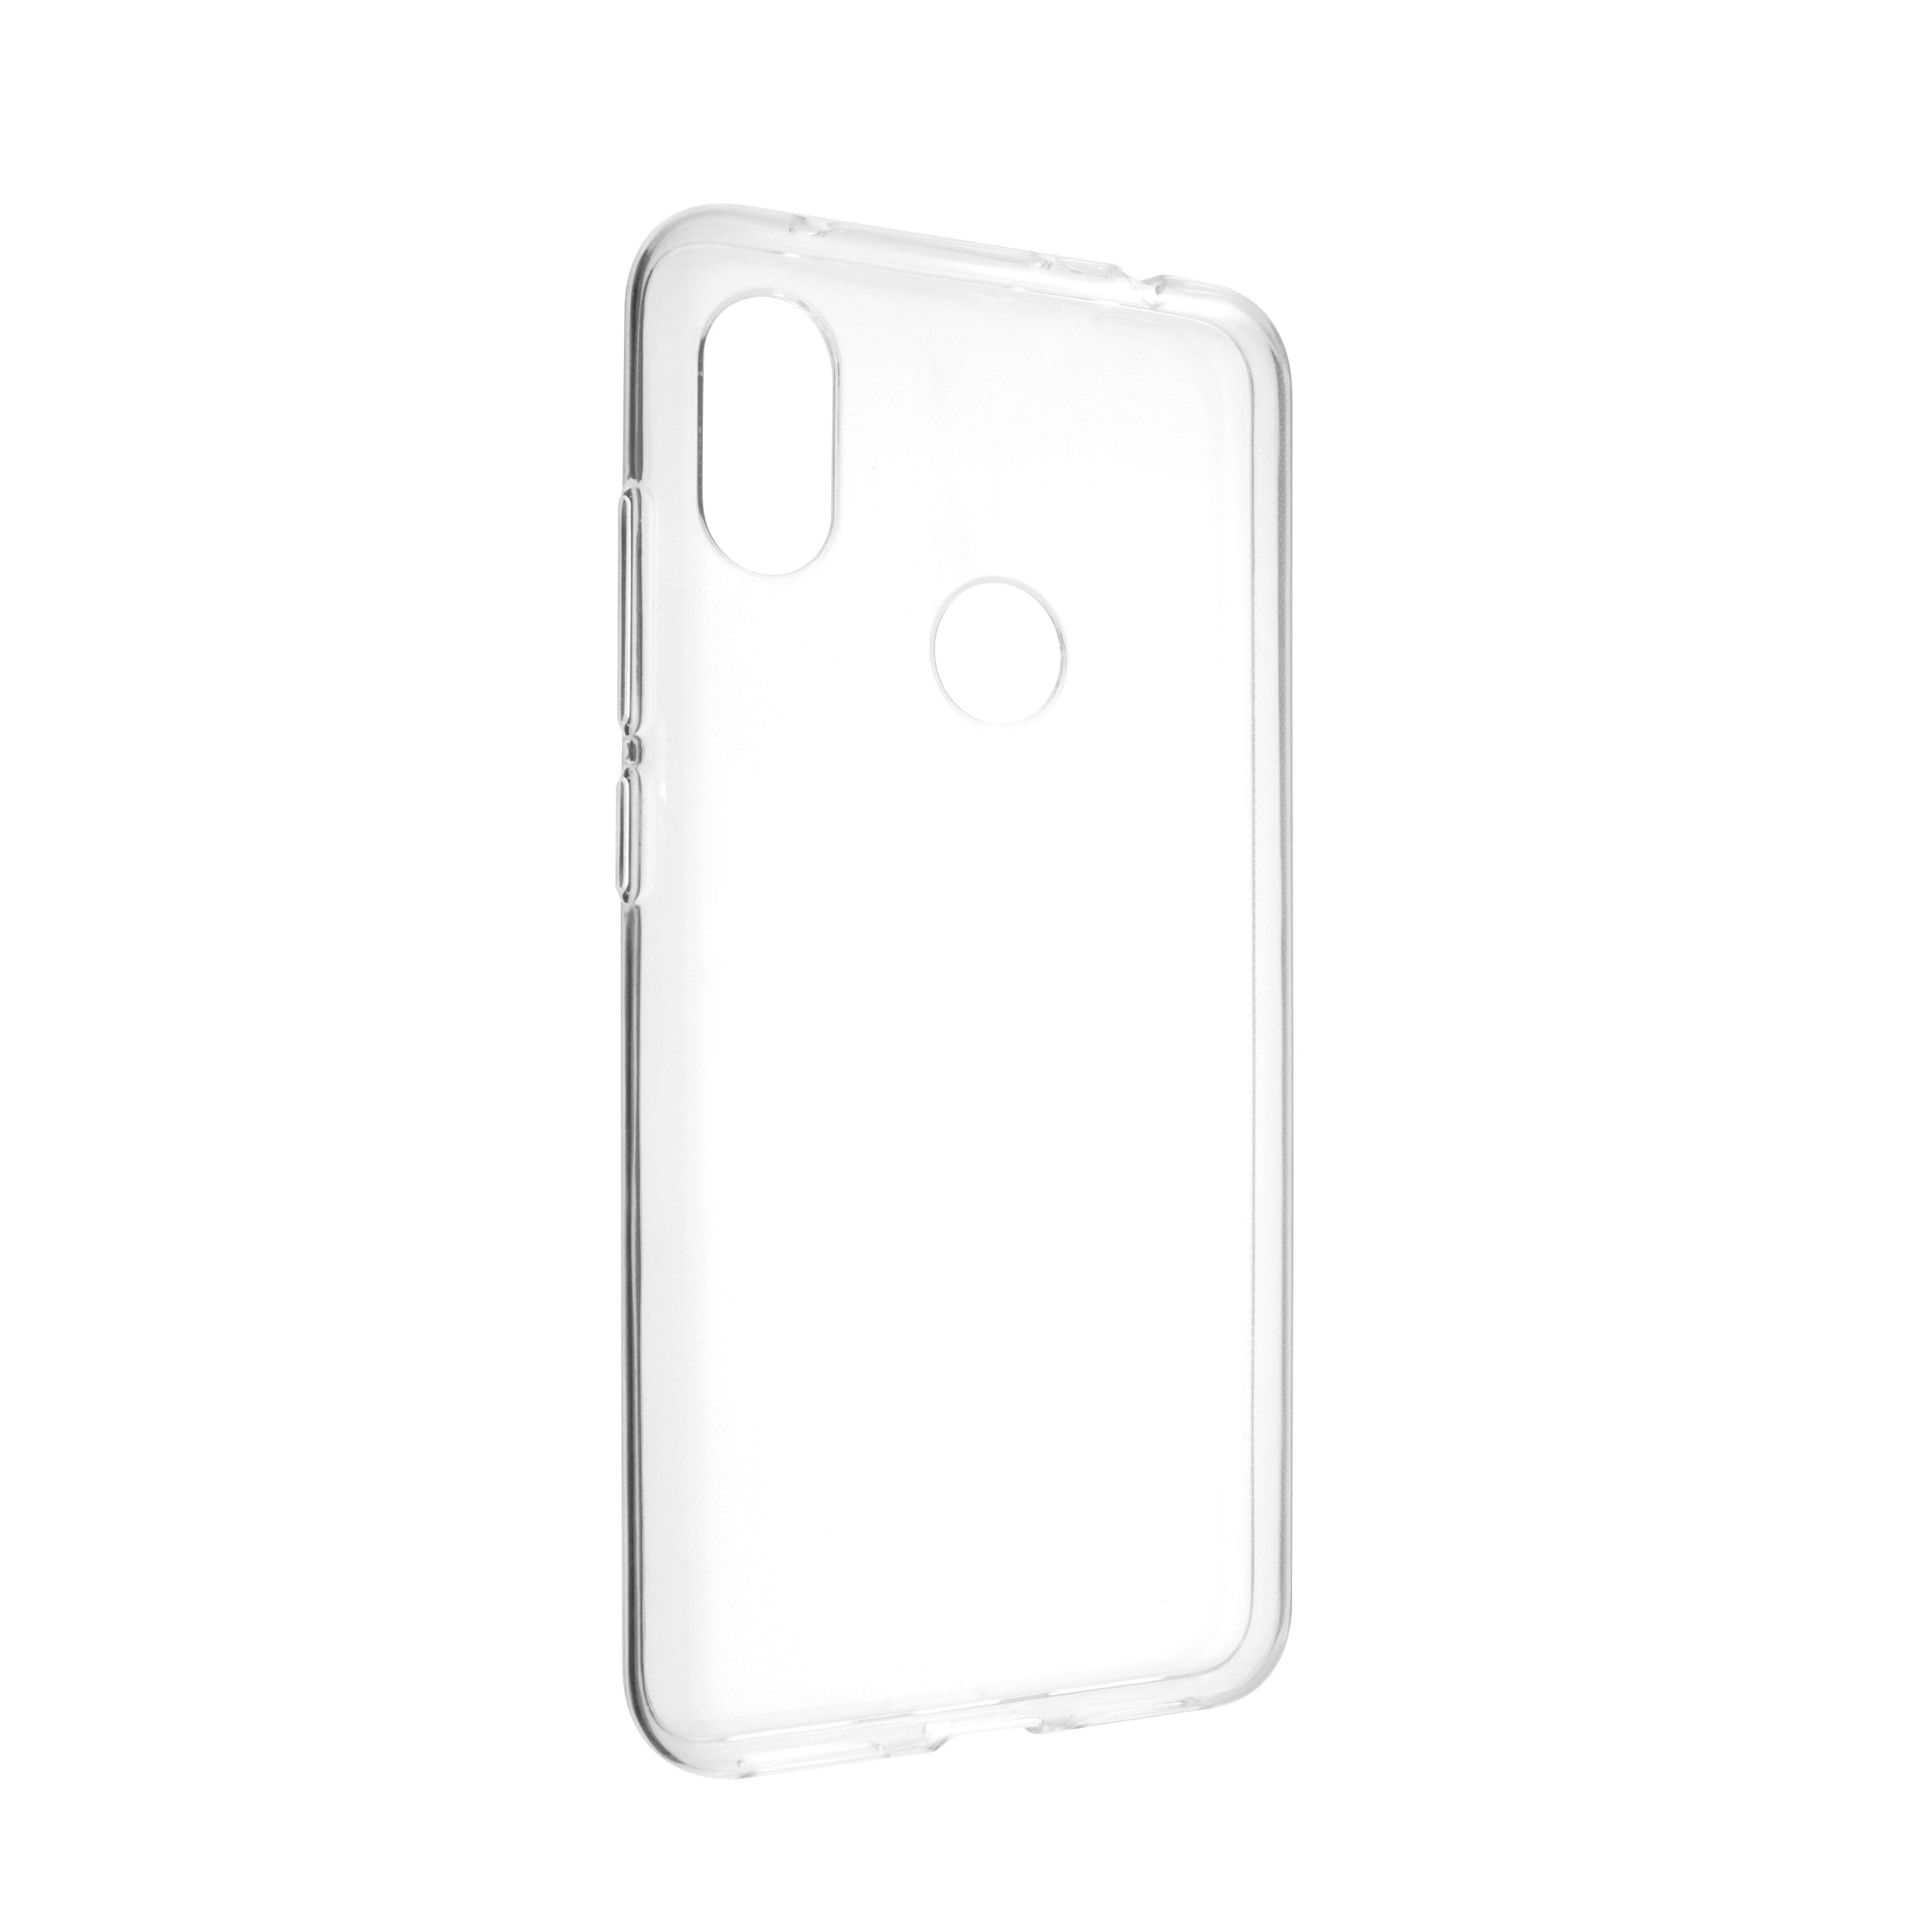 Ultratenké TPU gelové pouzdro FIXED Skin pro Xiaomi Redmi Note 6 Pro, 0,6 mm, čiré